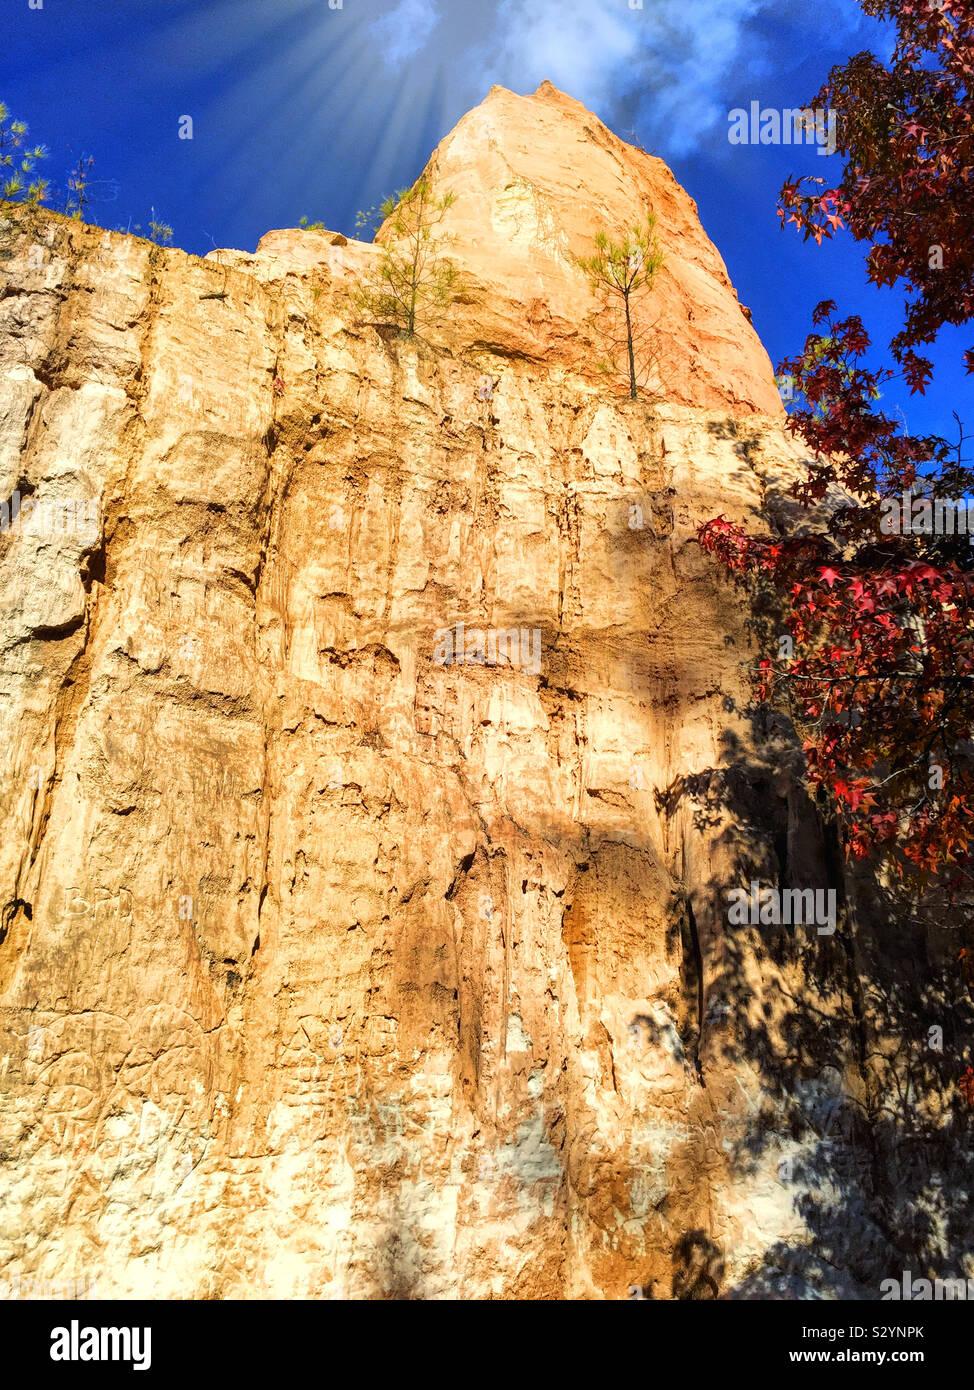 Little Grand Canyon at Providence Canyon State Park in Lumpkin Georgia USA shot on a beautiful autumn season day. Stock Photo